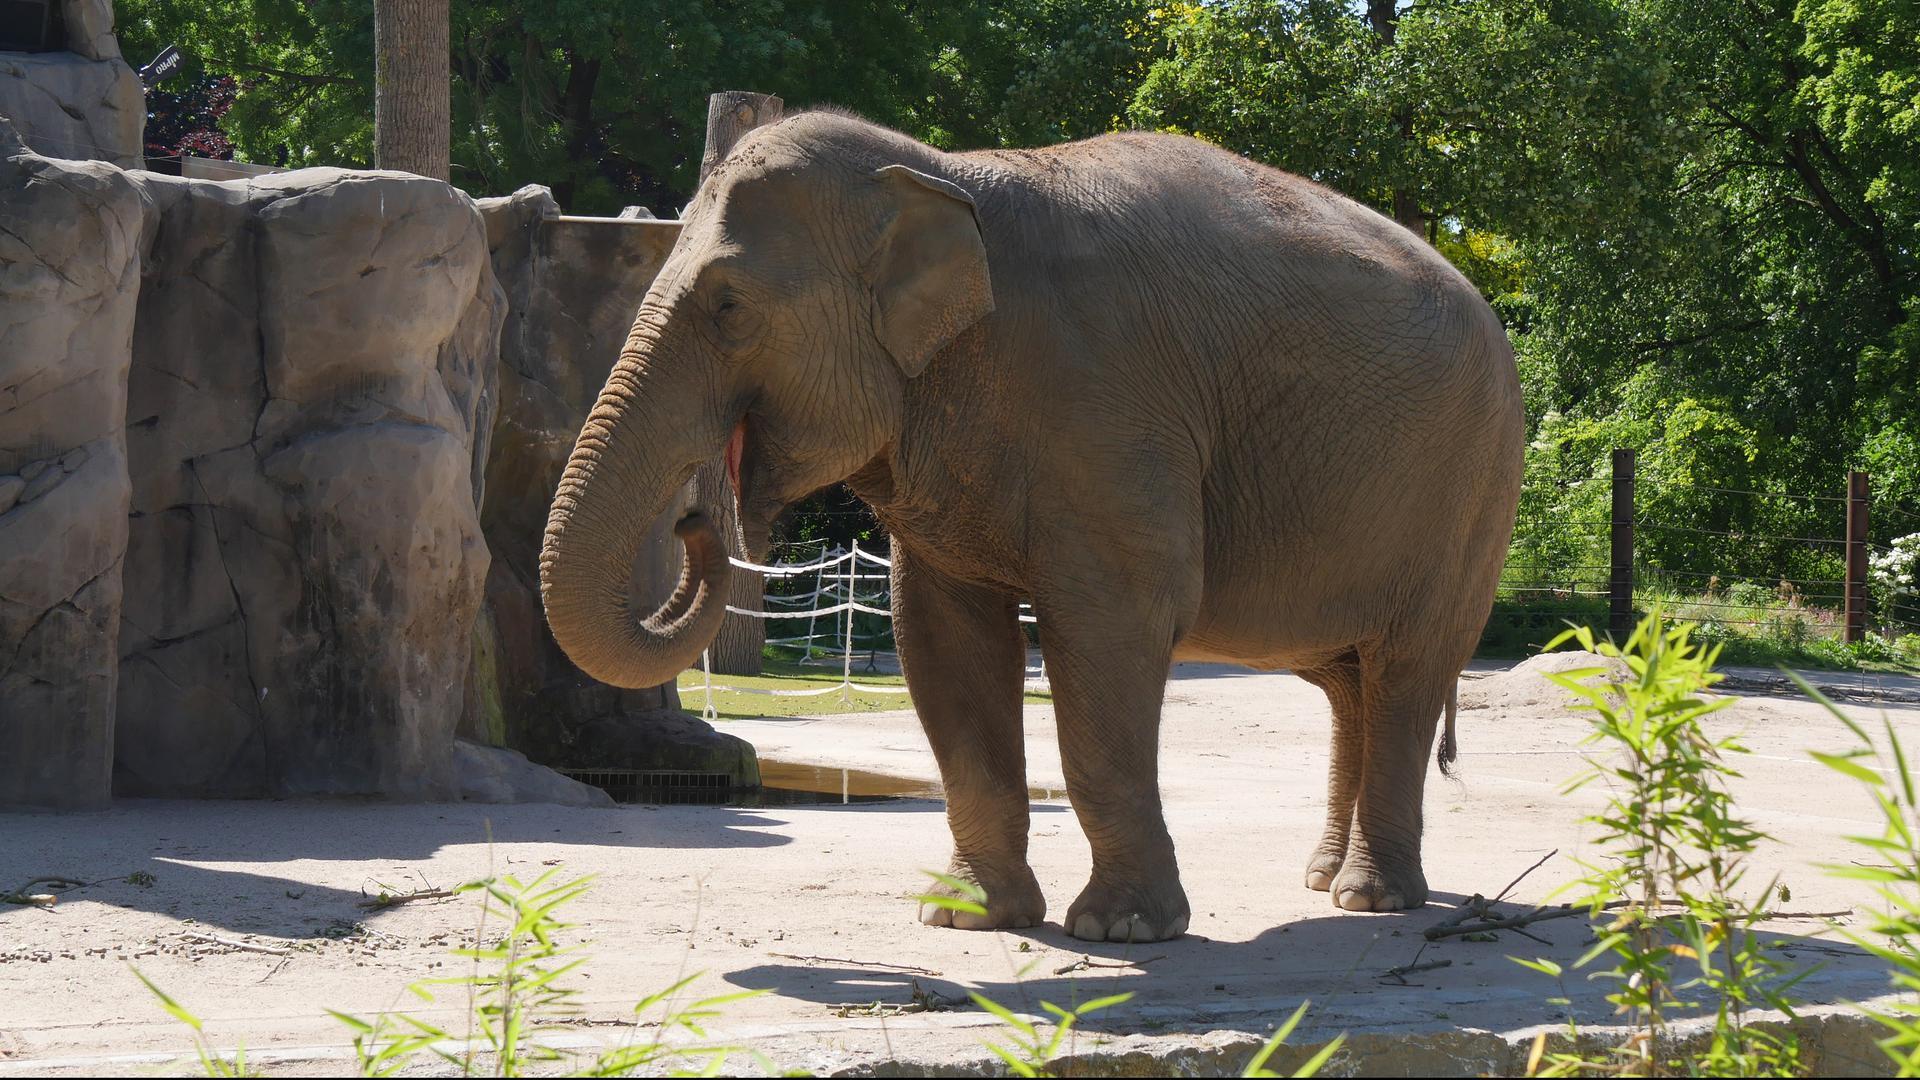 Eine Elefantenkuh im Zoo Karlsruhe